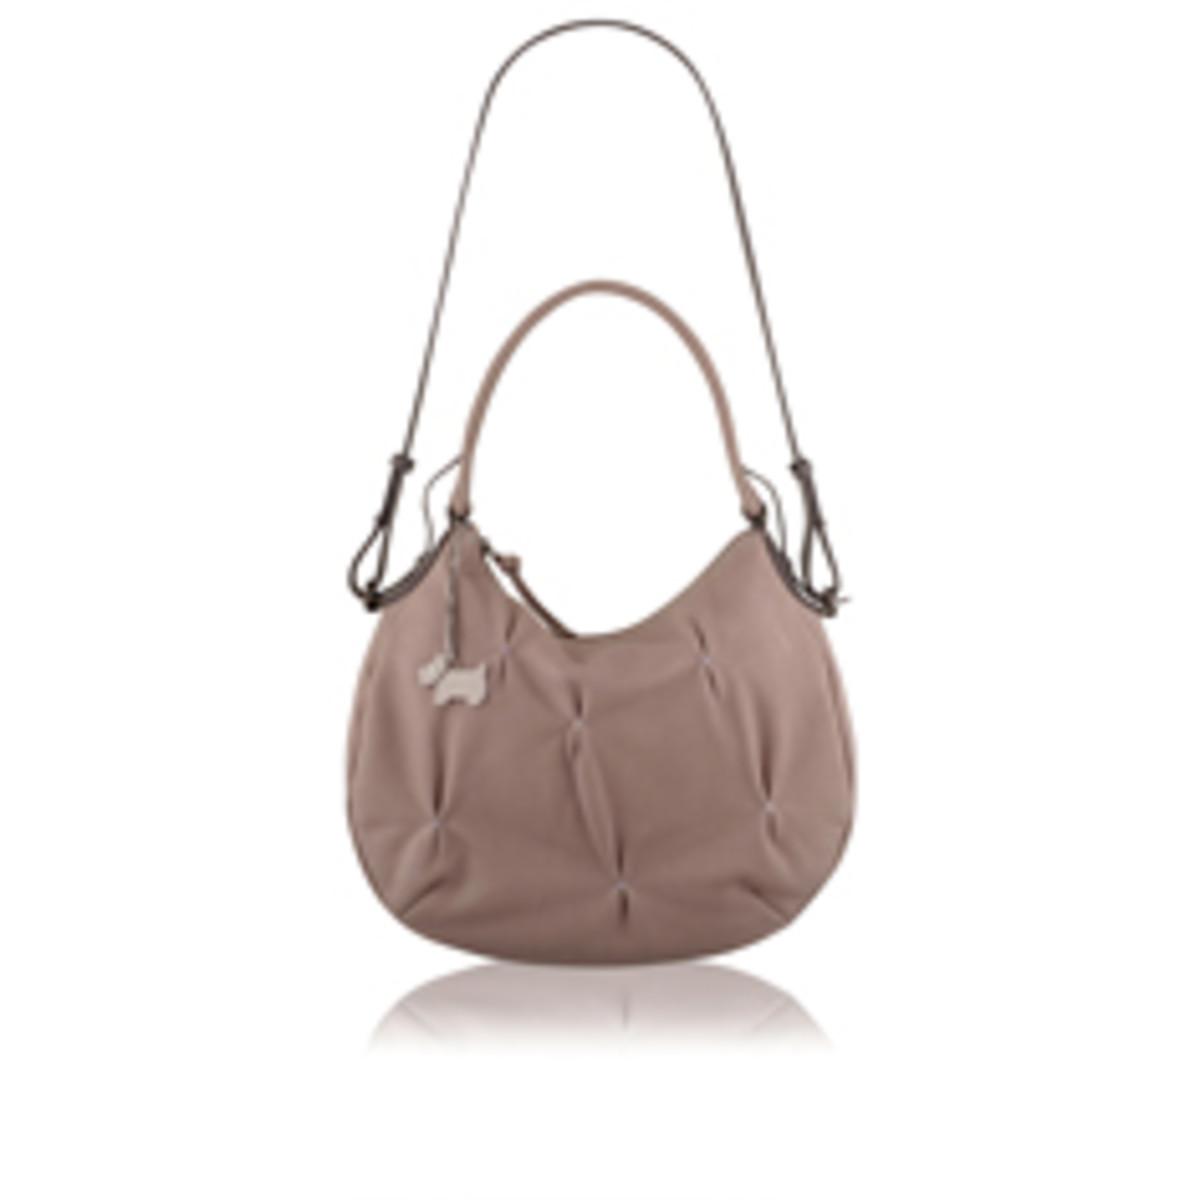 Radley Handbag Blyth